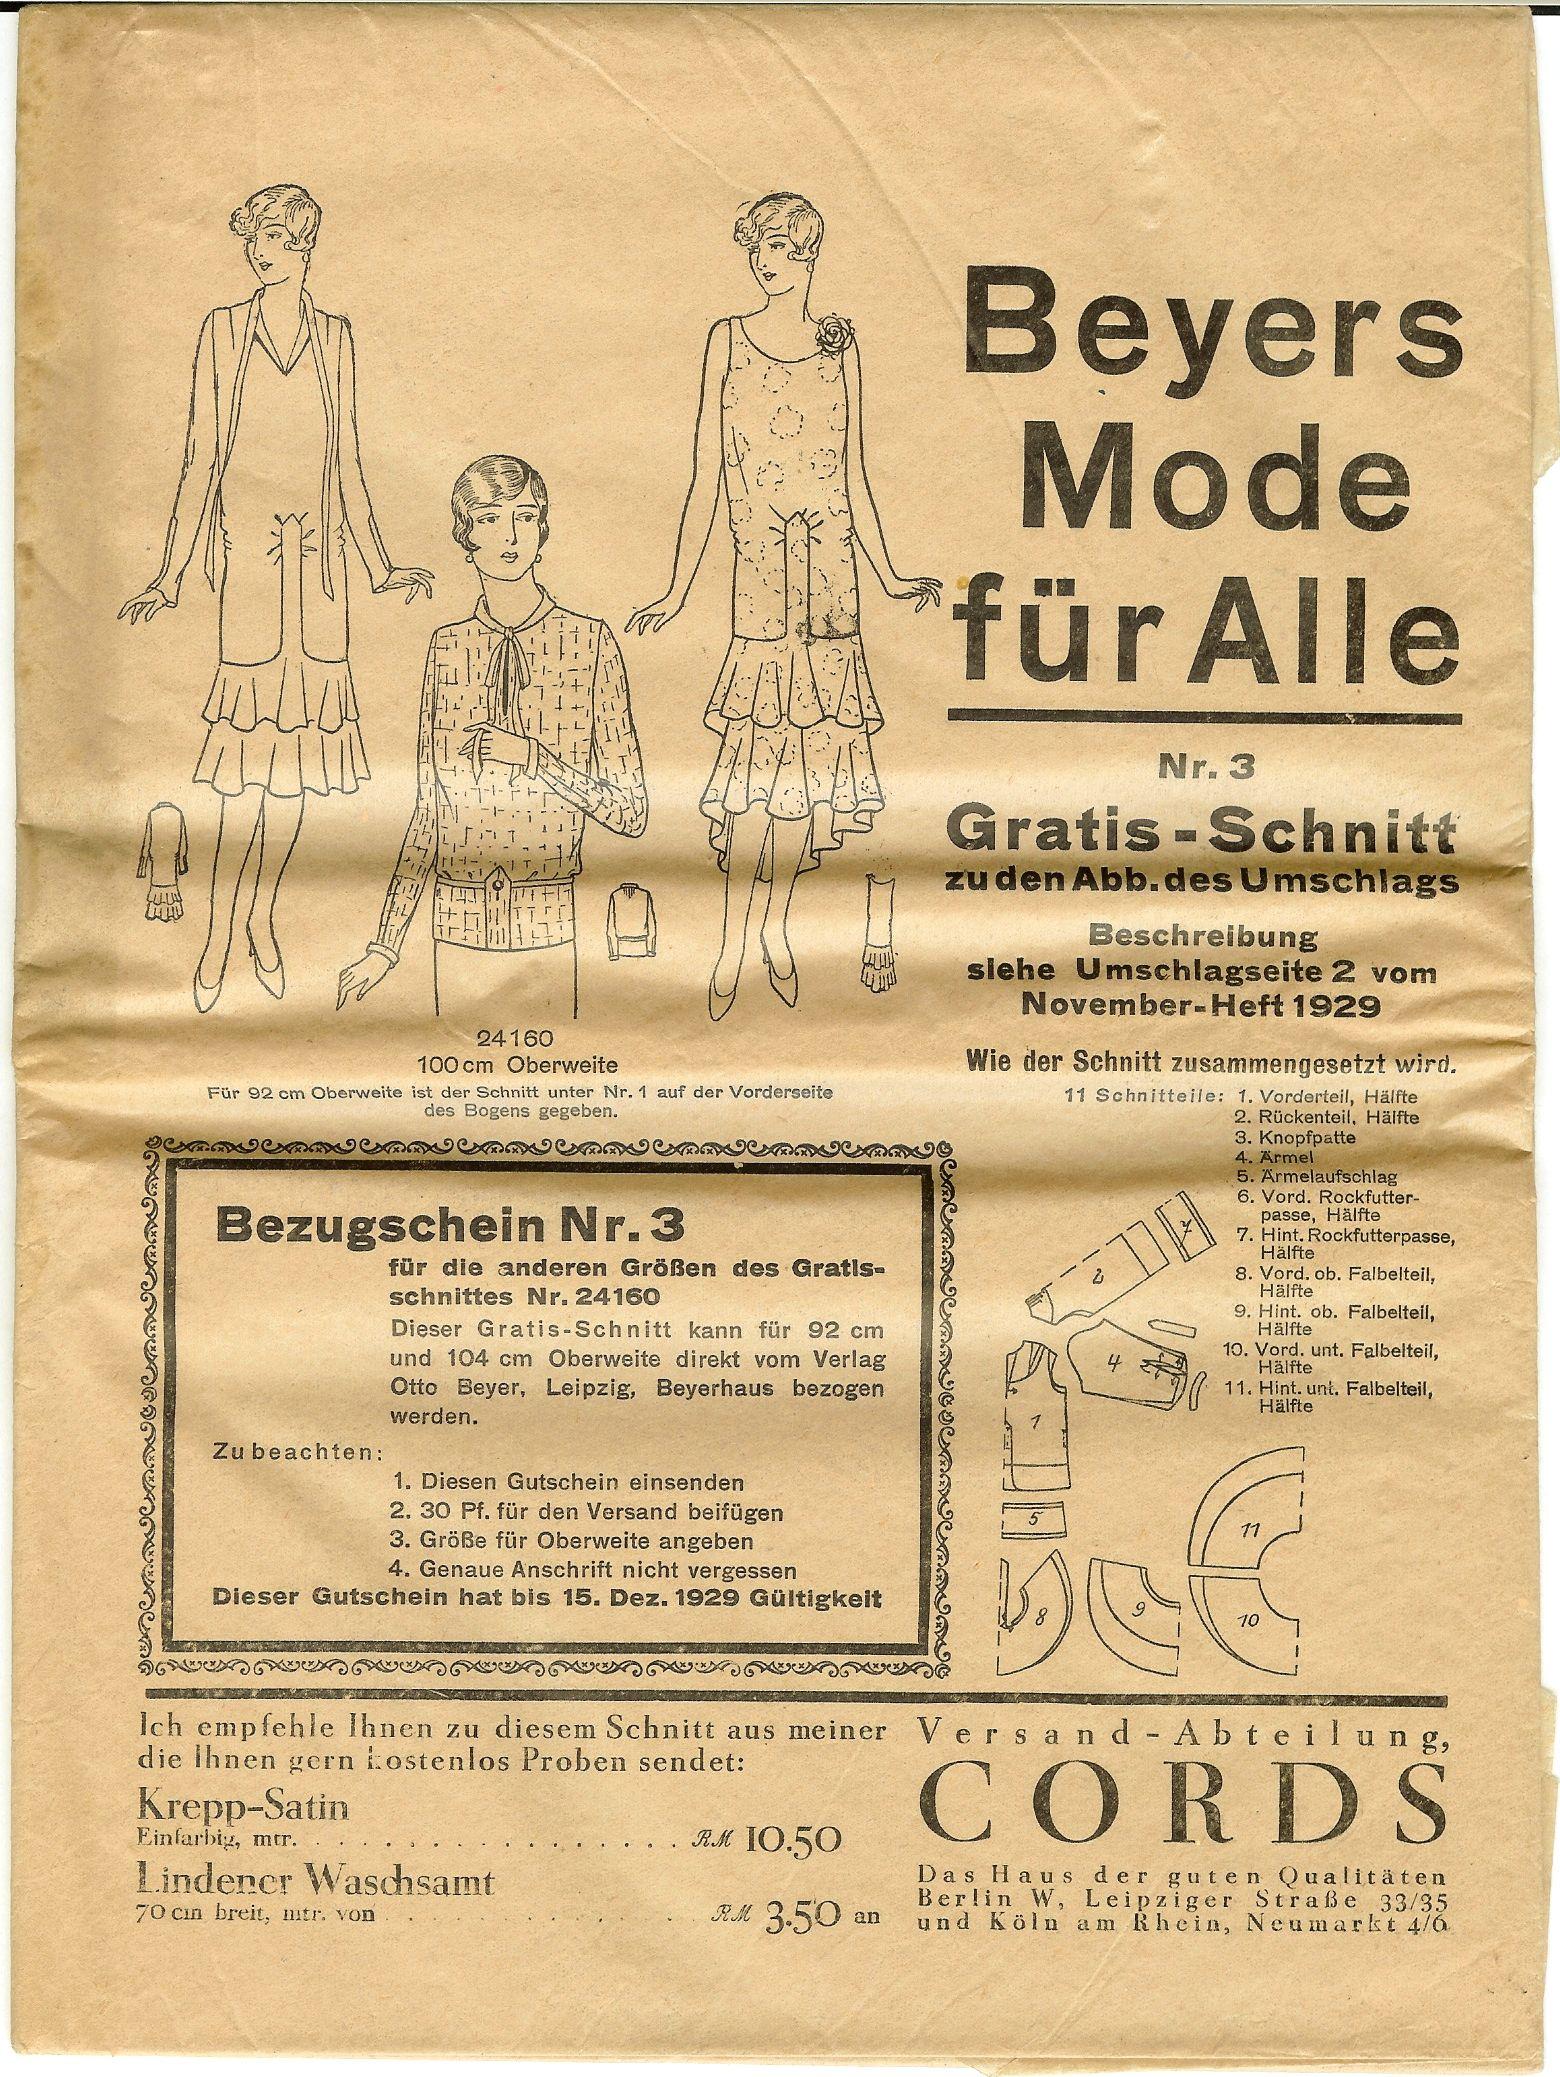 Beyers 24160